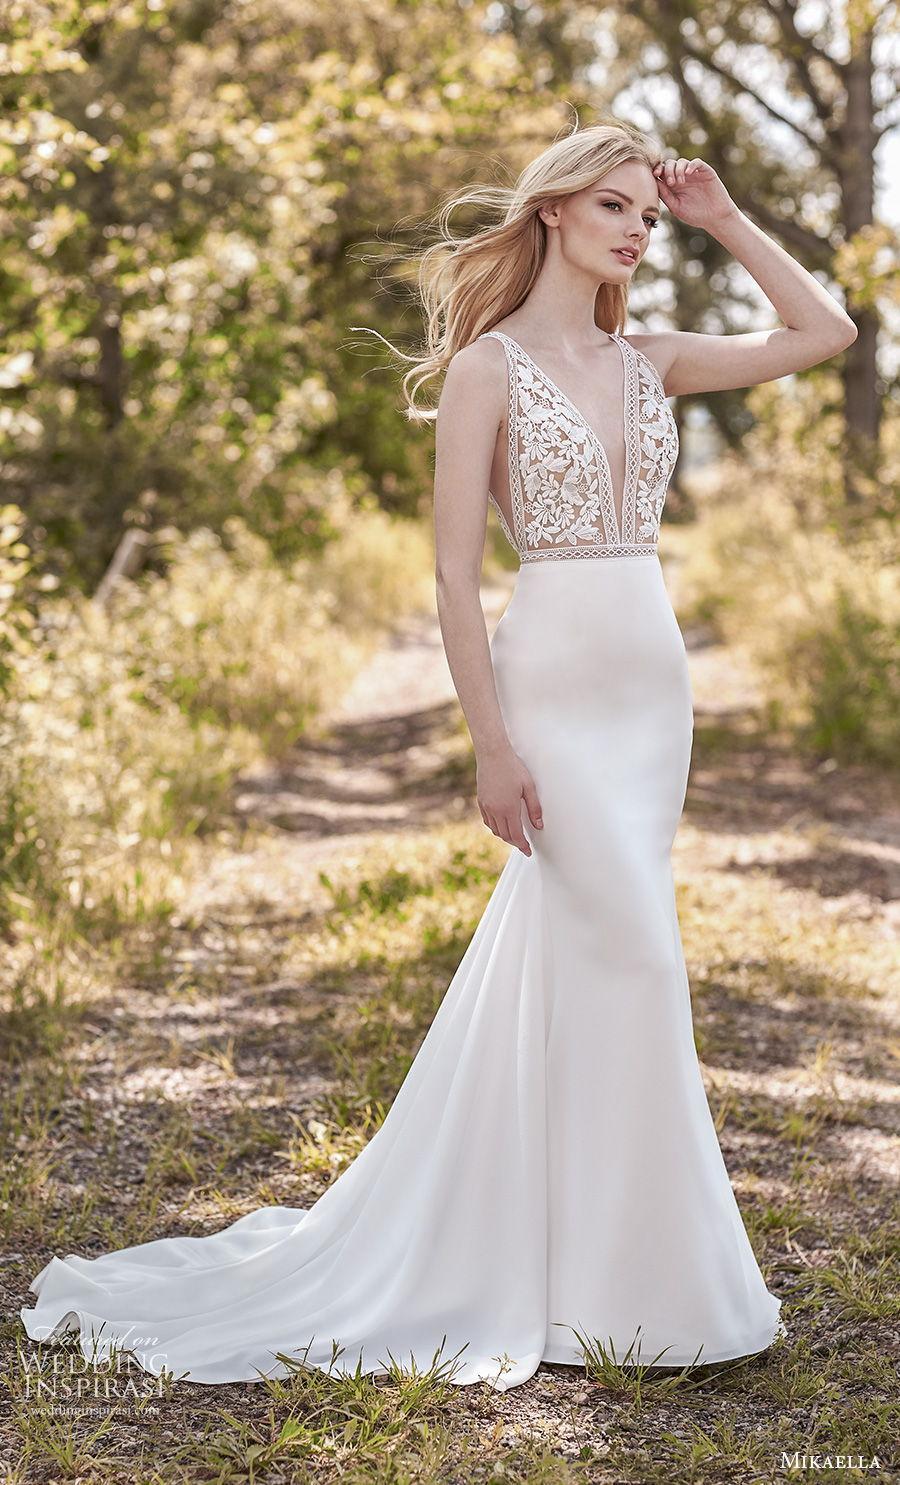 mikaella spring 2020 bridal sleeveless deep v neck heavily embellished bodice romantic sexy fit and flare sheath wedding dress v back medium train (10) mv